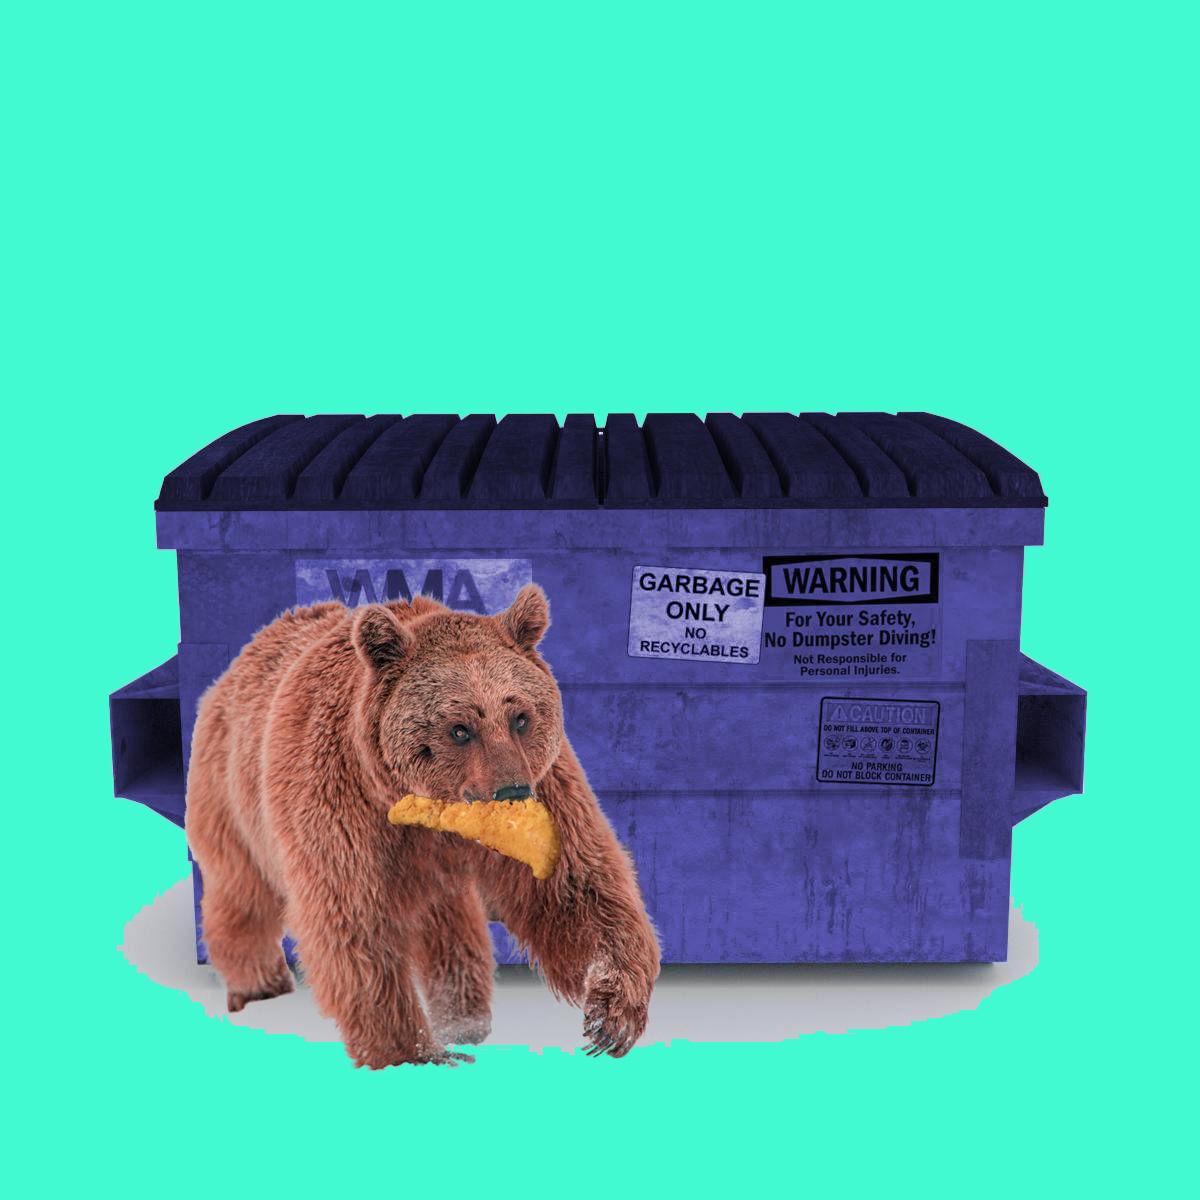 dumpster_bear_koostra